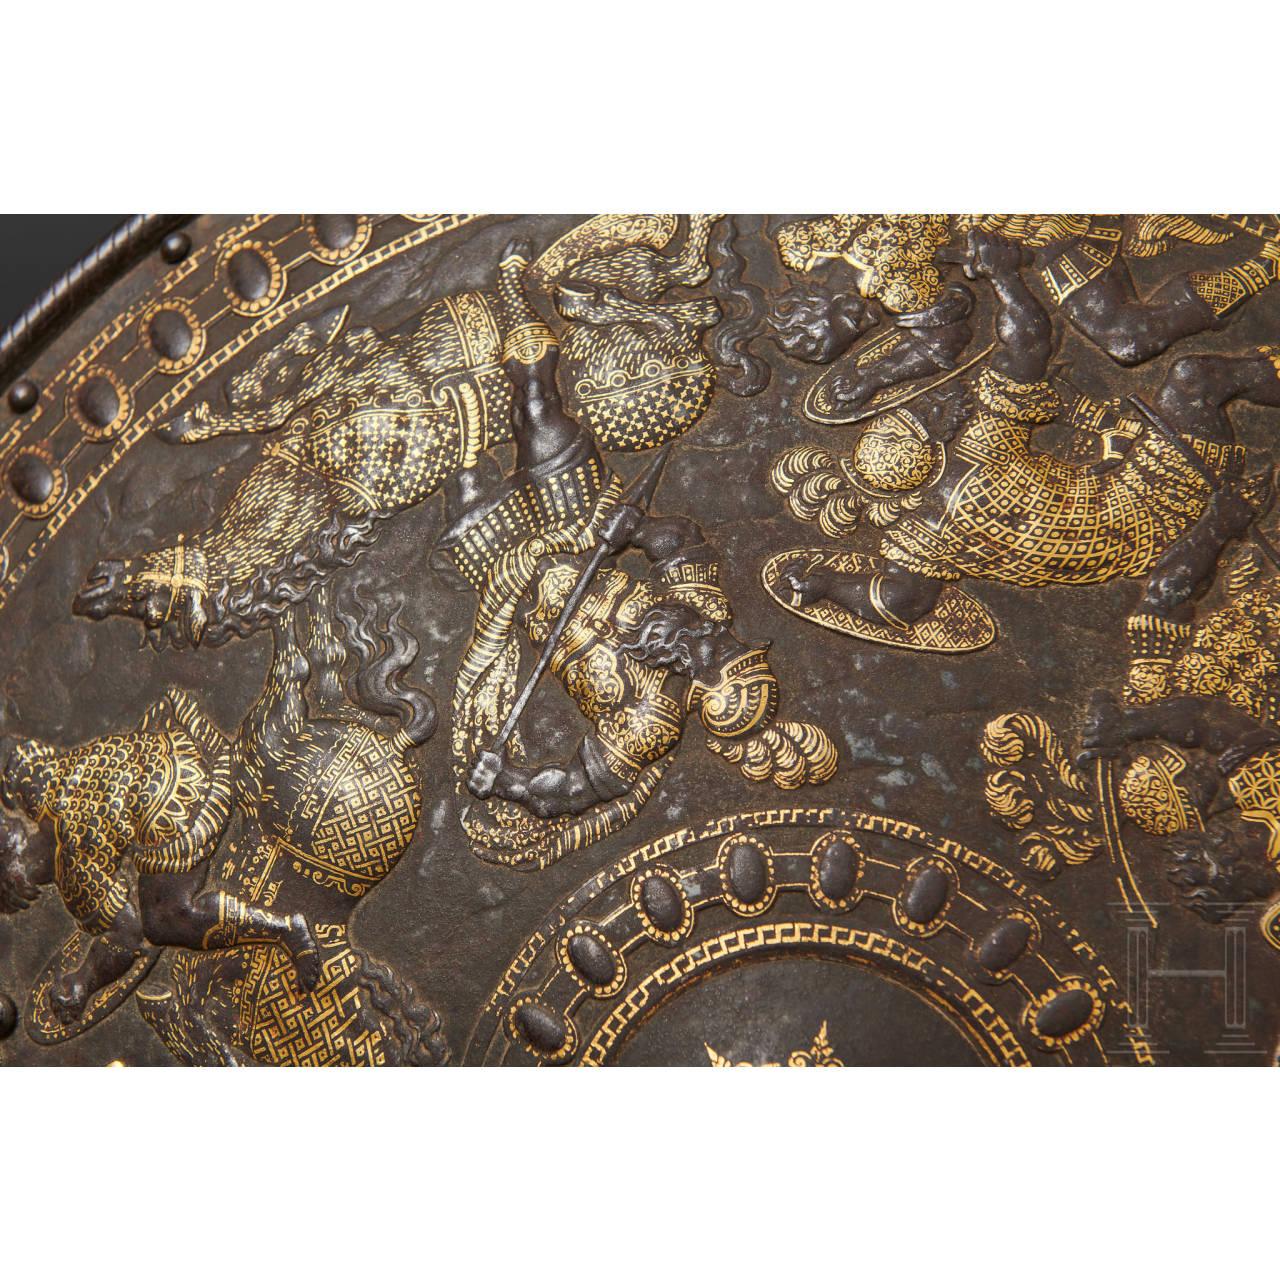 Goldtauschierter Parade-Schild, Mailand, um 1560/70